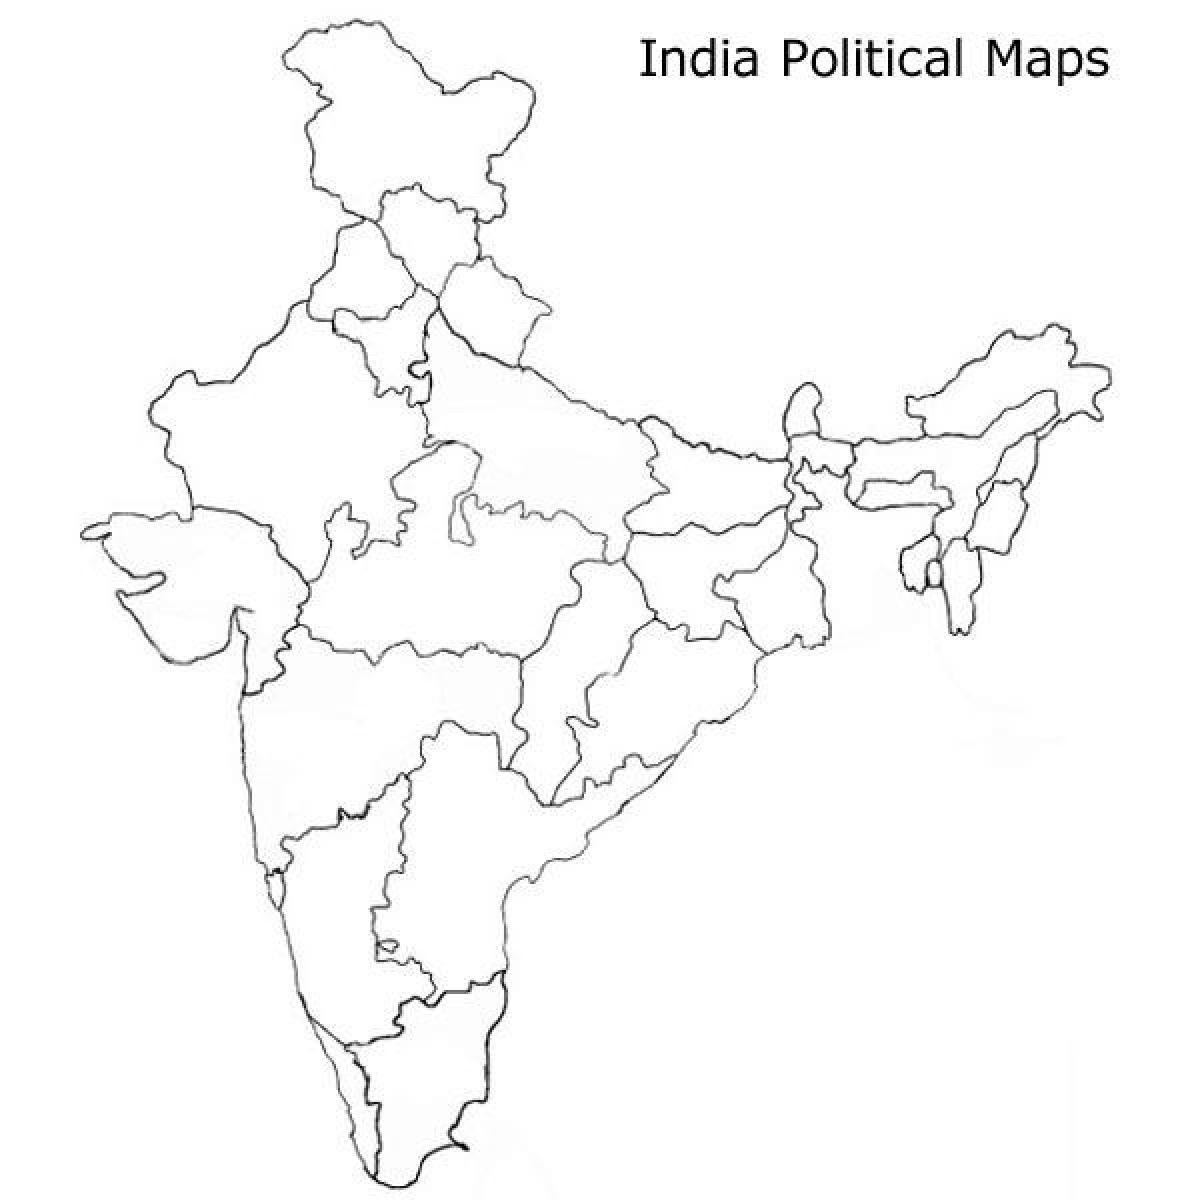 Carte Inde Vierge.Carte Politique De L Inde Vierge Imprimable Blanc Carte